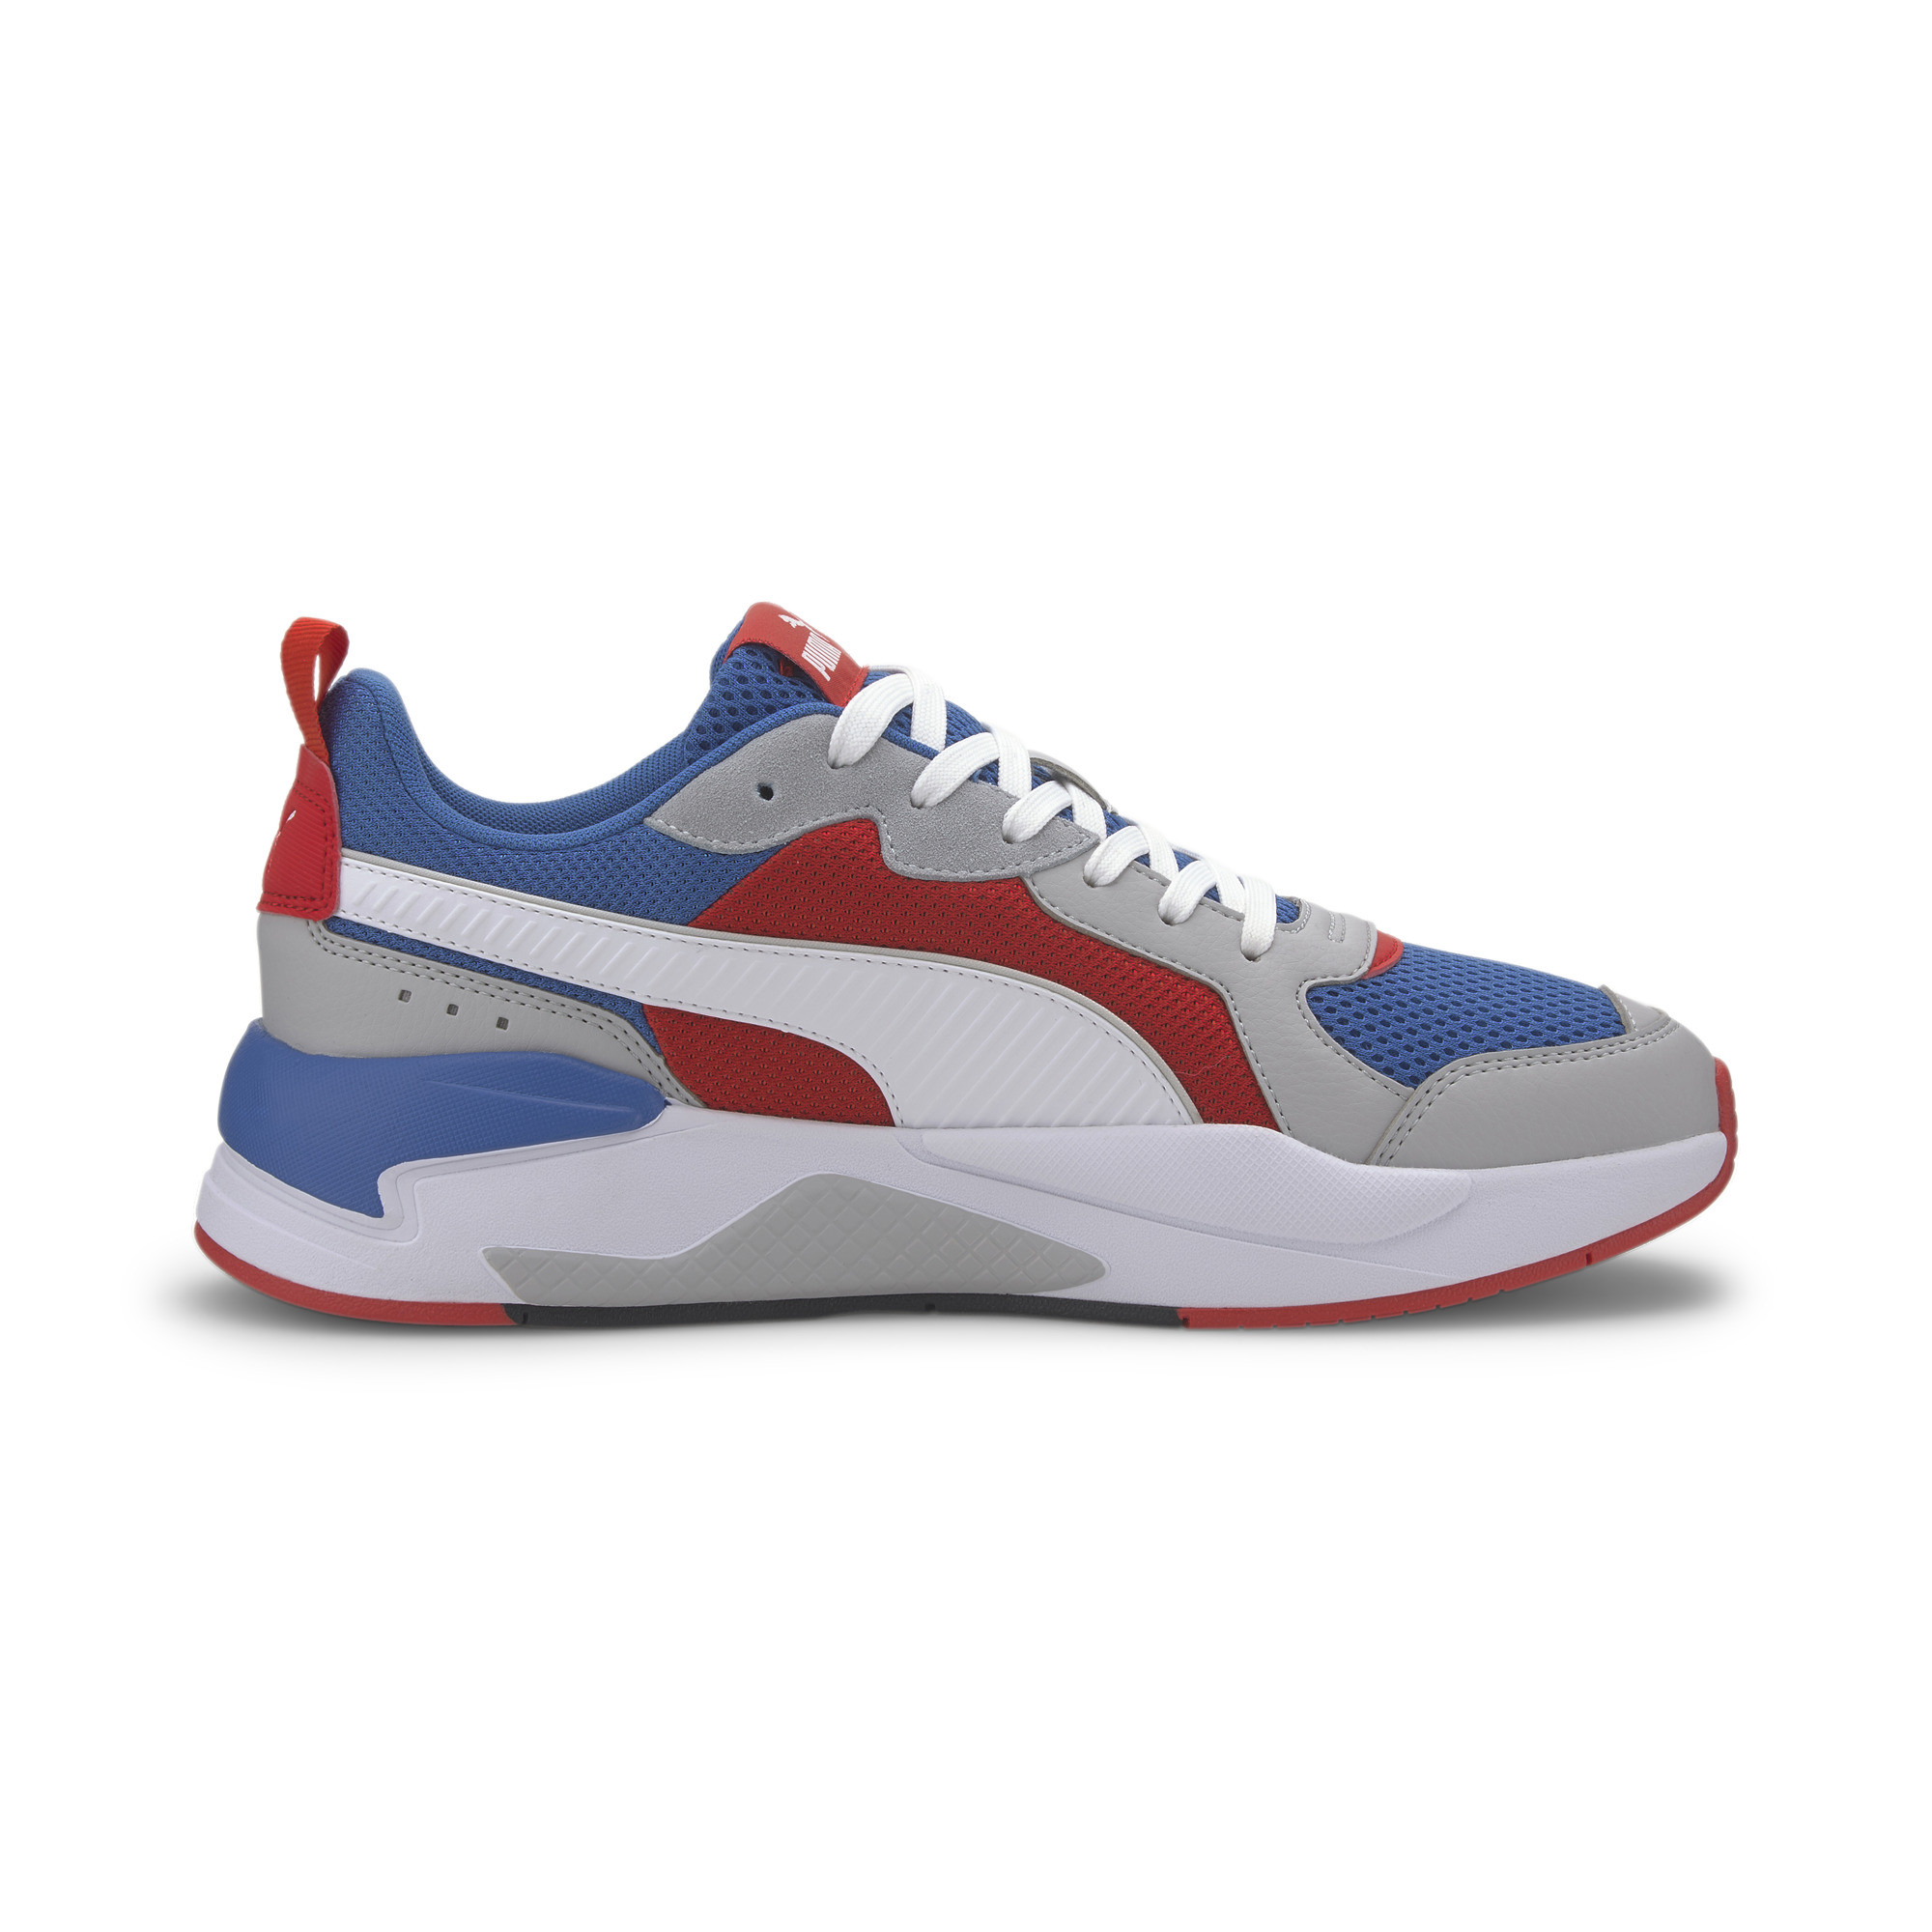 PUMA-Men-039-s-X-RAY-Sneakers thumbnail 14